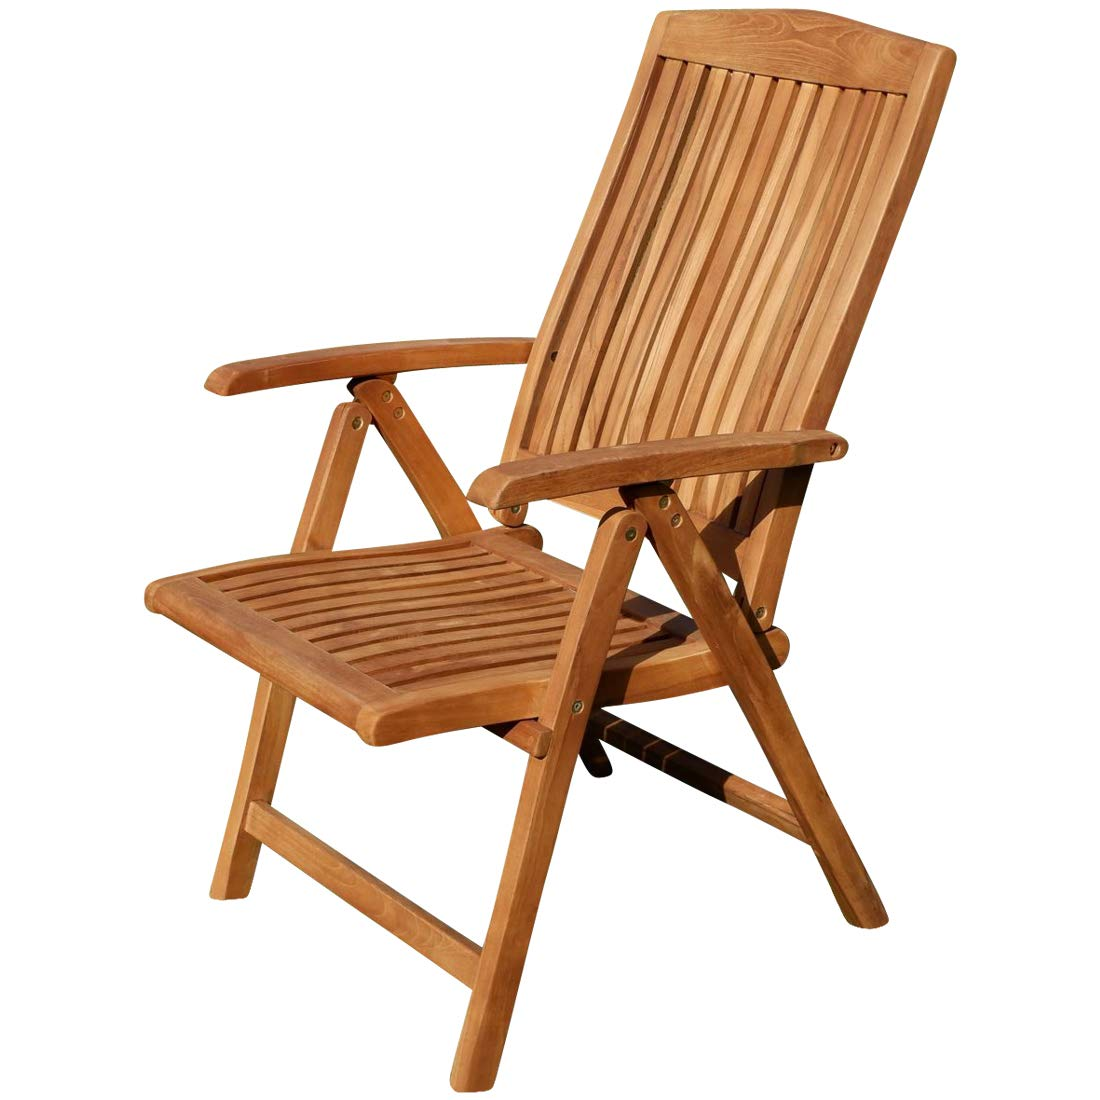 ASS Teak Design Hochlehner Gartensessel Gartenstuhl Sessel Holzsessel Klappsessel Gartenm/öbel Holz sehr robust 7fach-verstellbar Modell JAV-Tobago